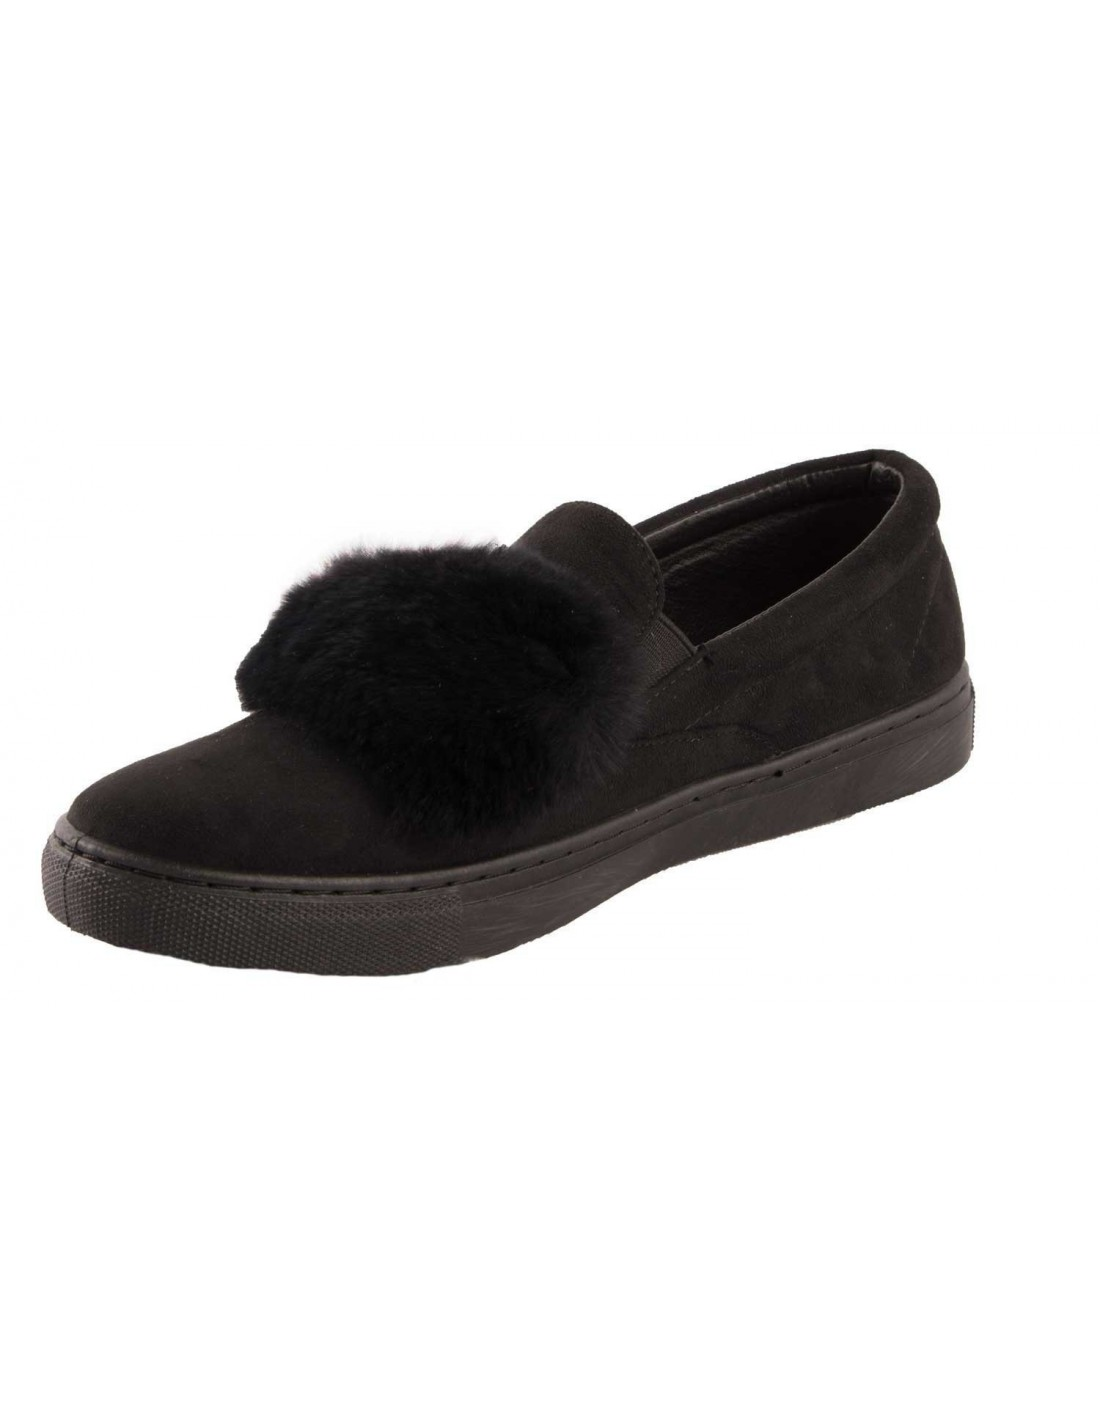 baskets femme fourrure noir slip on noire bande fourrure synth tique. Black Bedroom Furniture Sets. Home Design Ideas